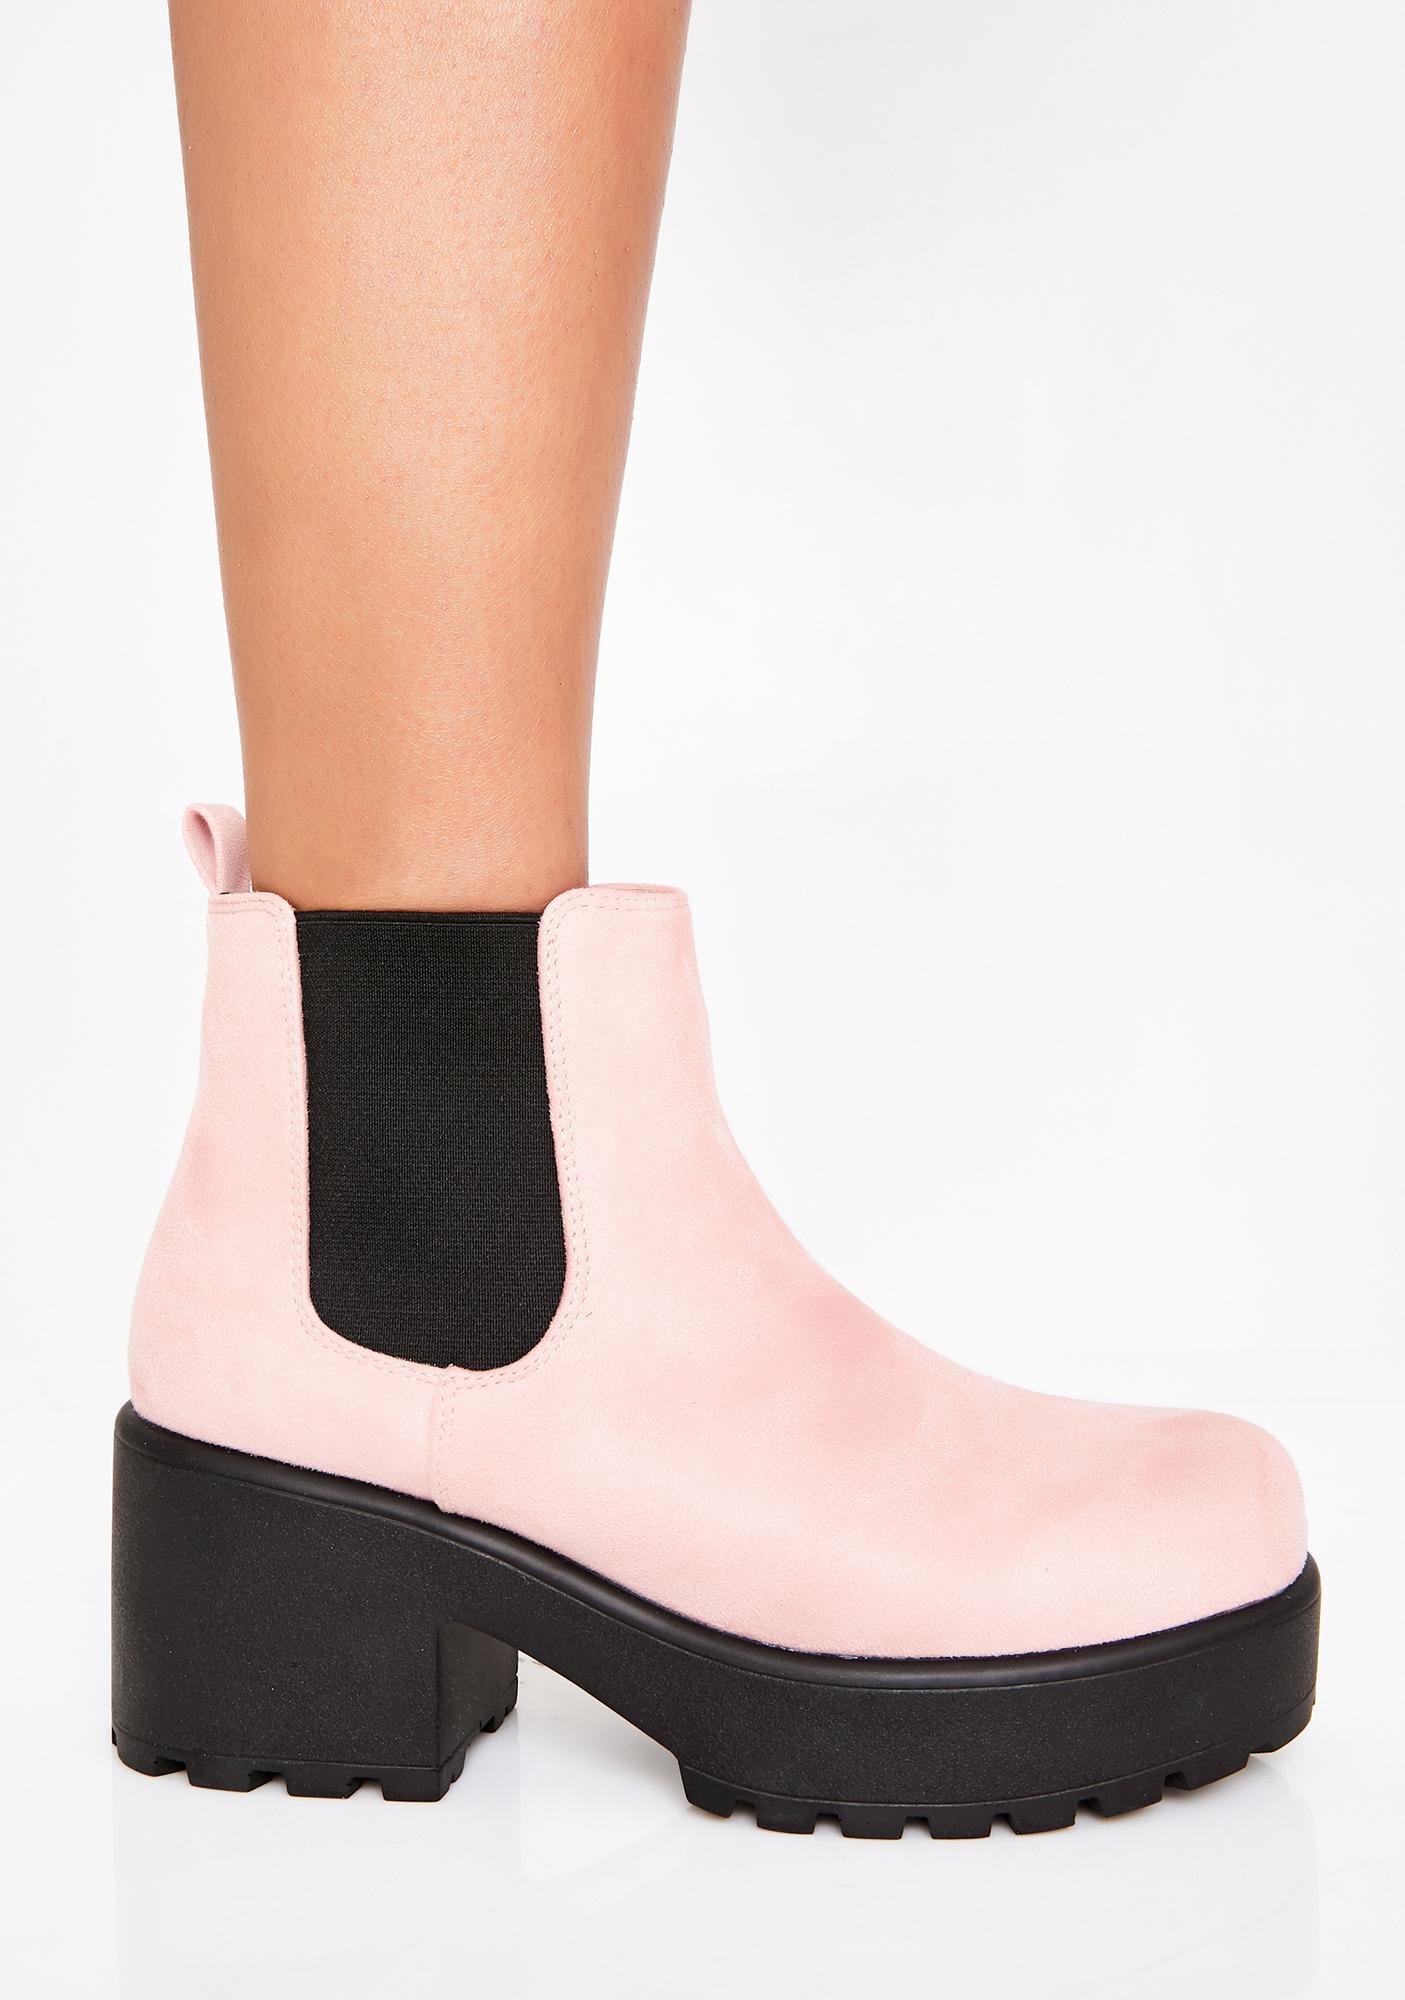 Koi Footwear Sweet Kai Chelsea Boots